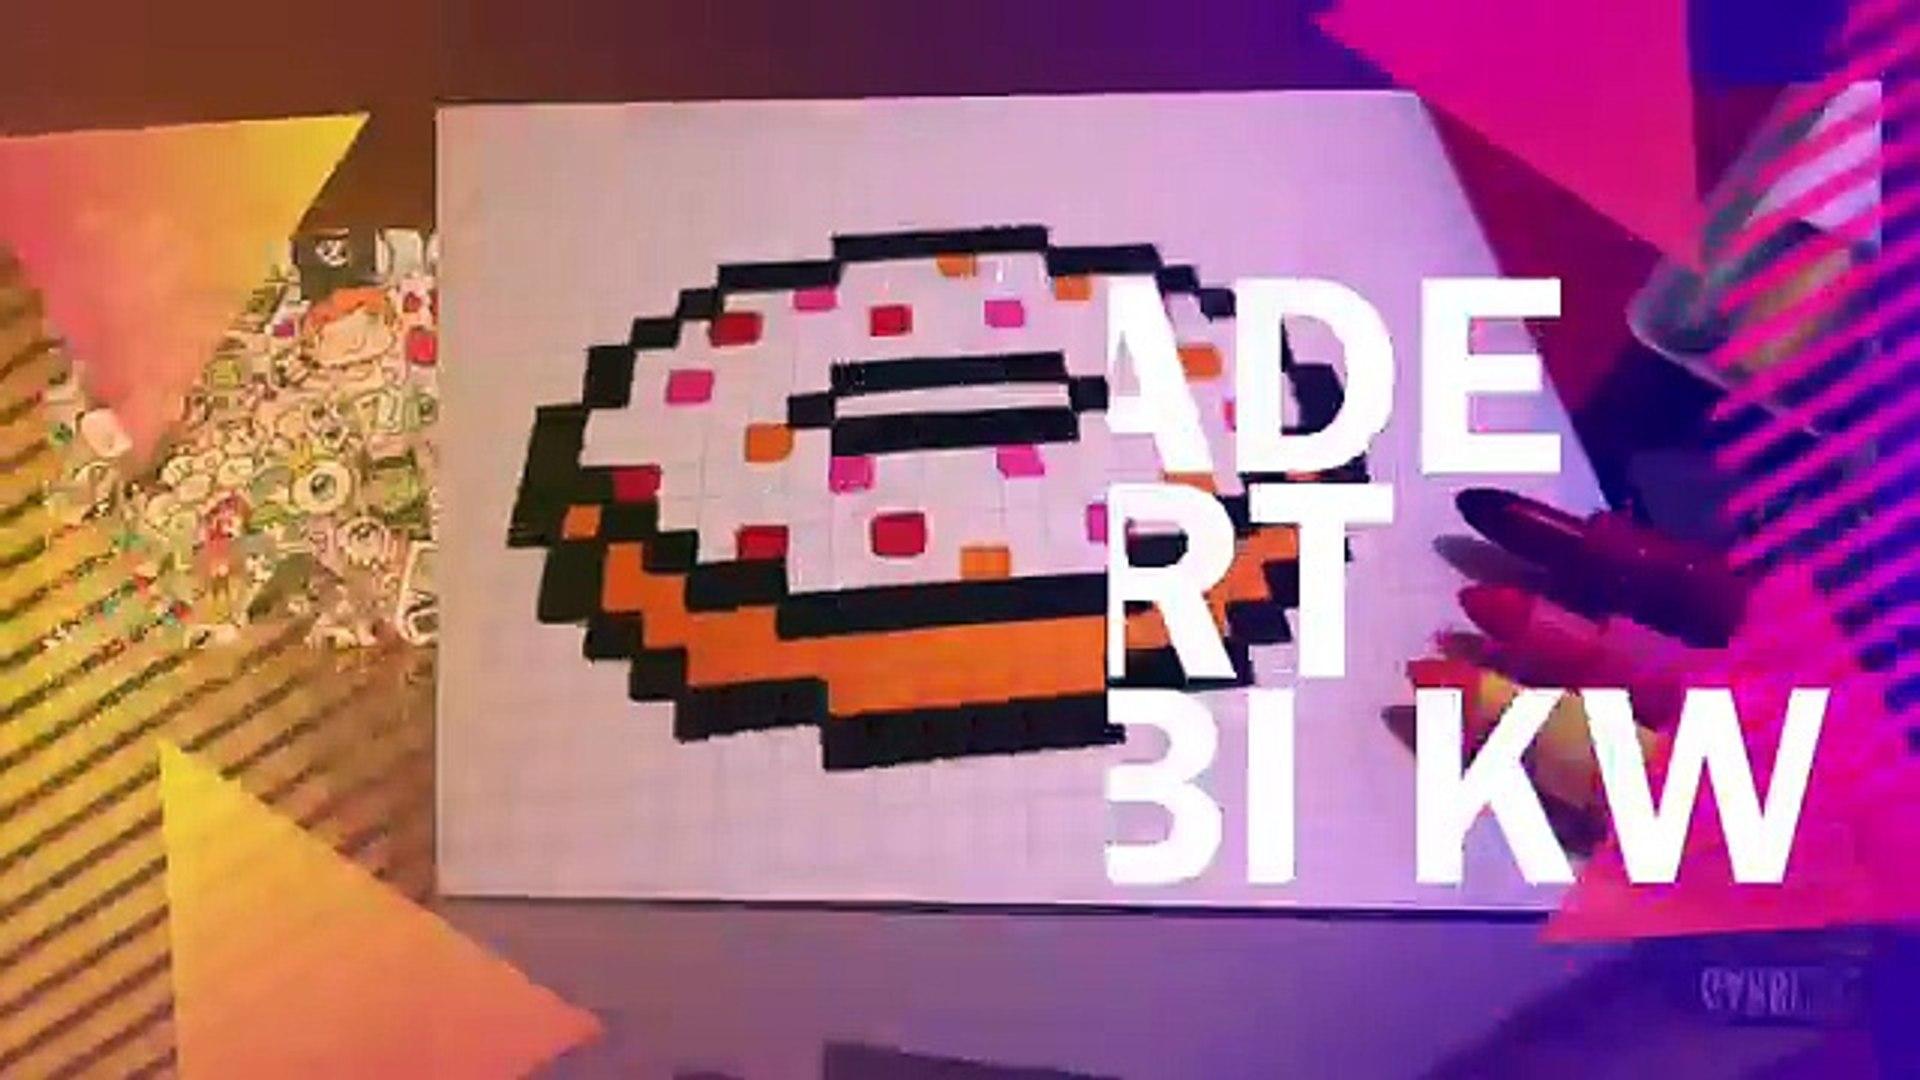 Handmade Pixel Art How To Draw A Kawaii Donut By Garbi Kw Pixelart